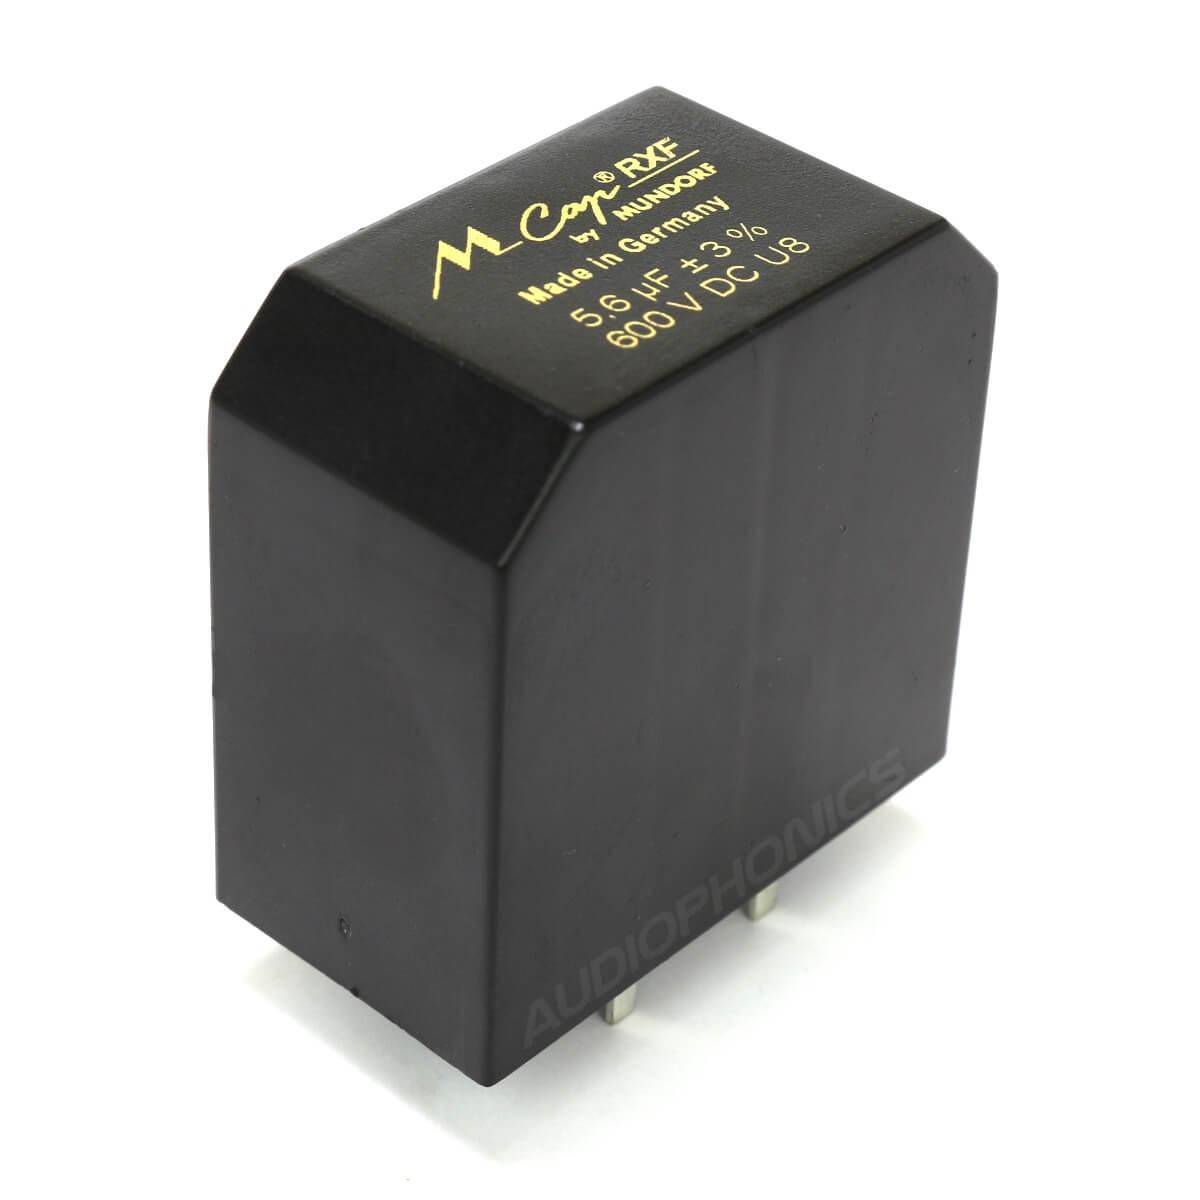 MUNDORF MCAP RXF Capacitor 800V 0.22μF